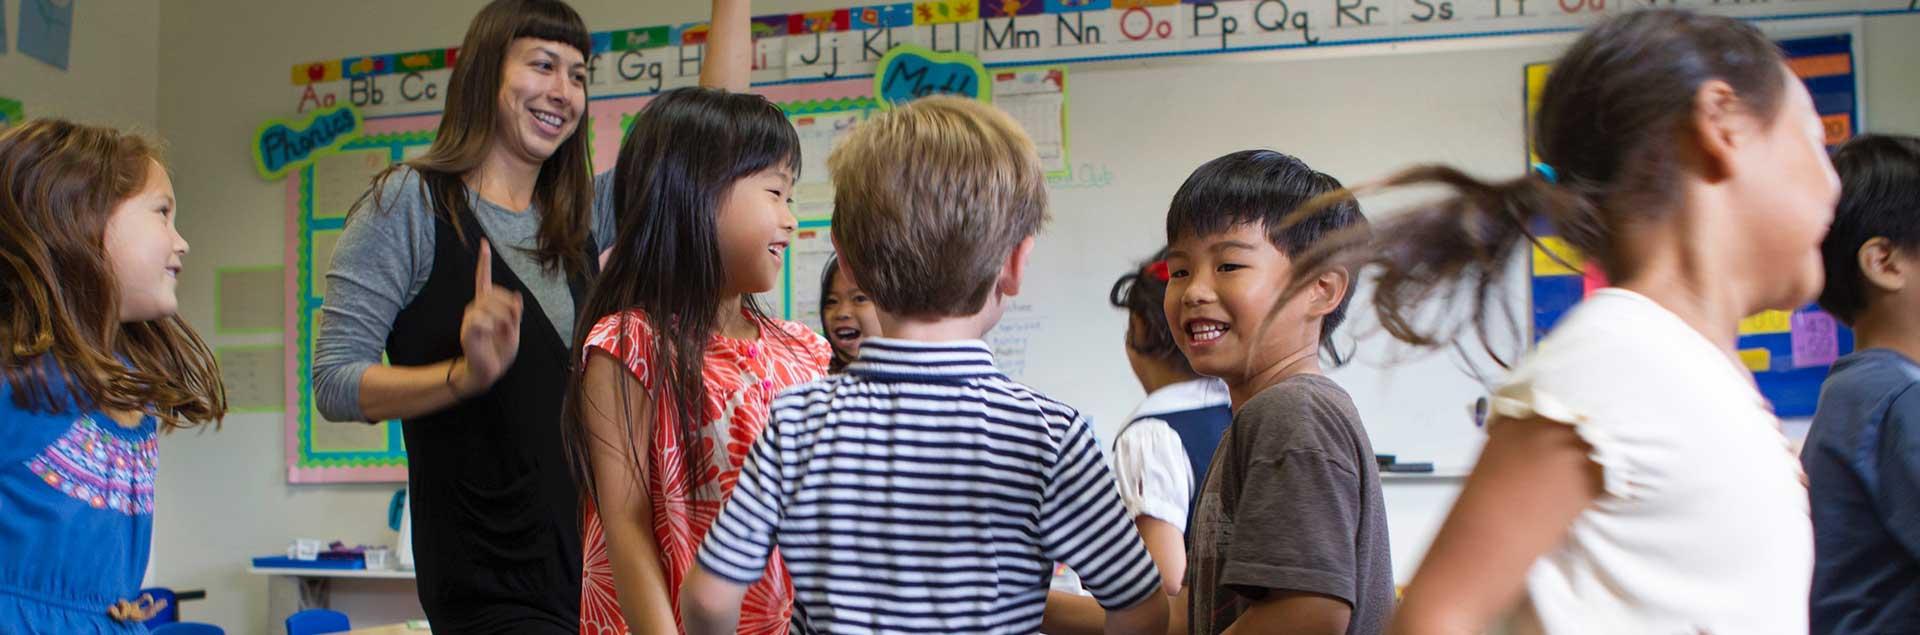 Kids dancing with teacher